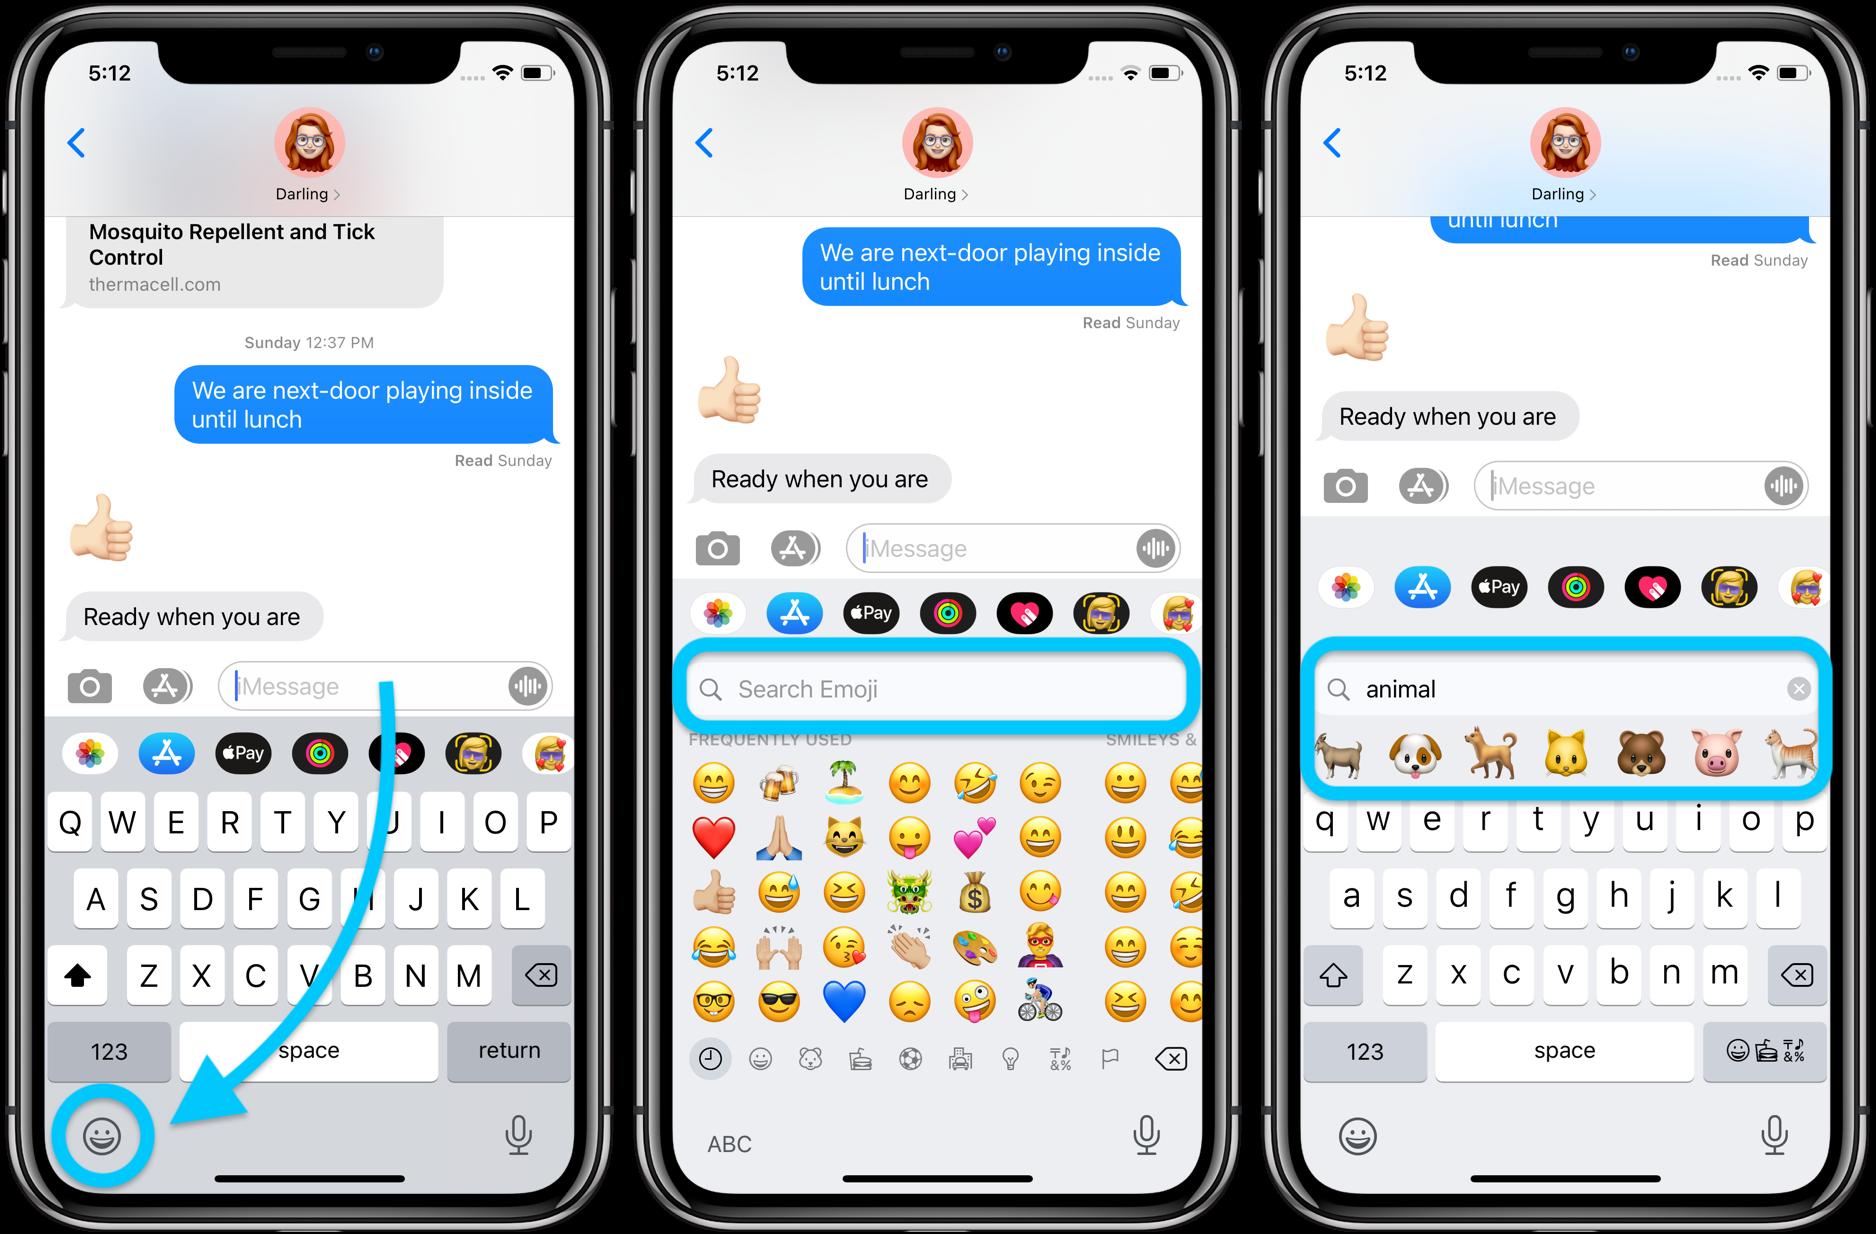 How to use iPhone emoji search iOS 14 walkthrough 1